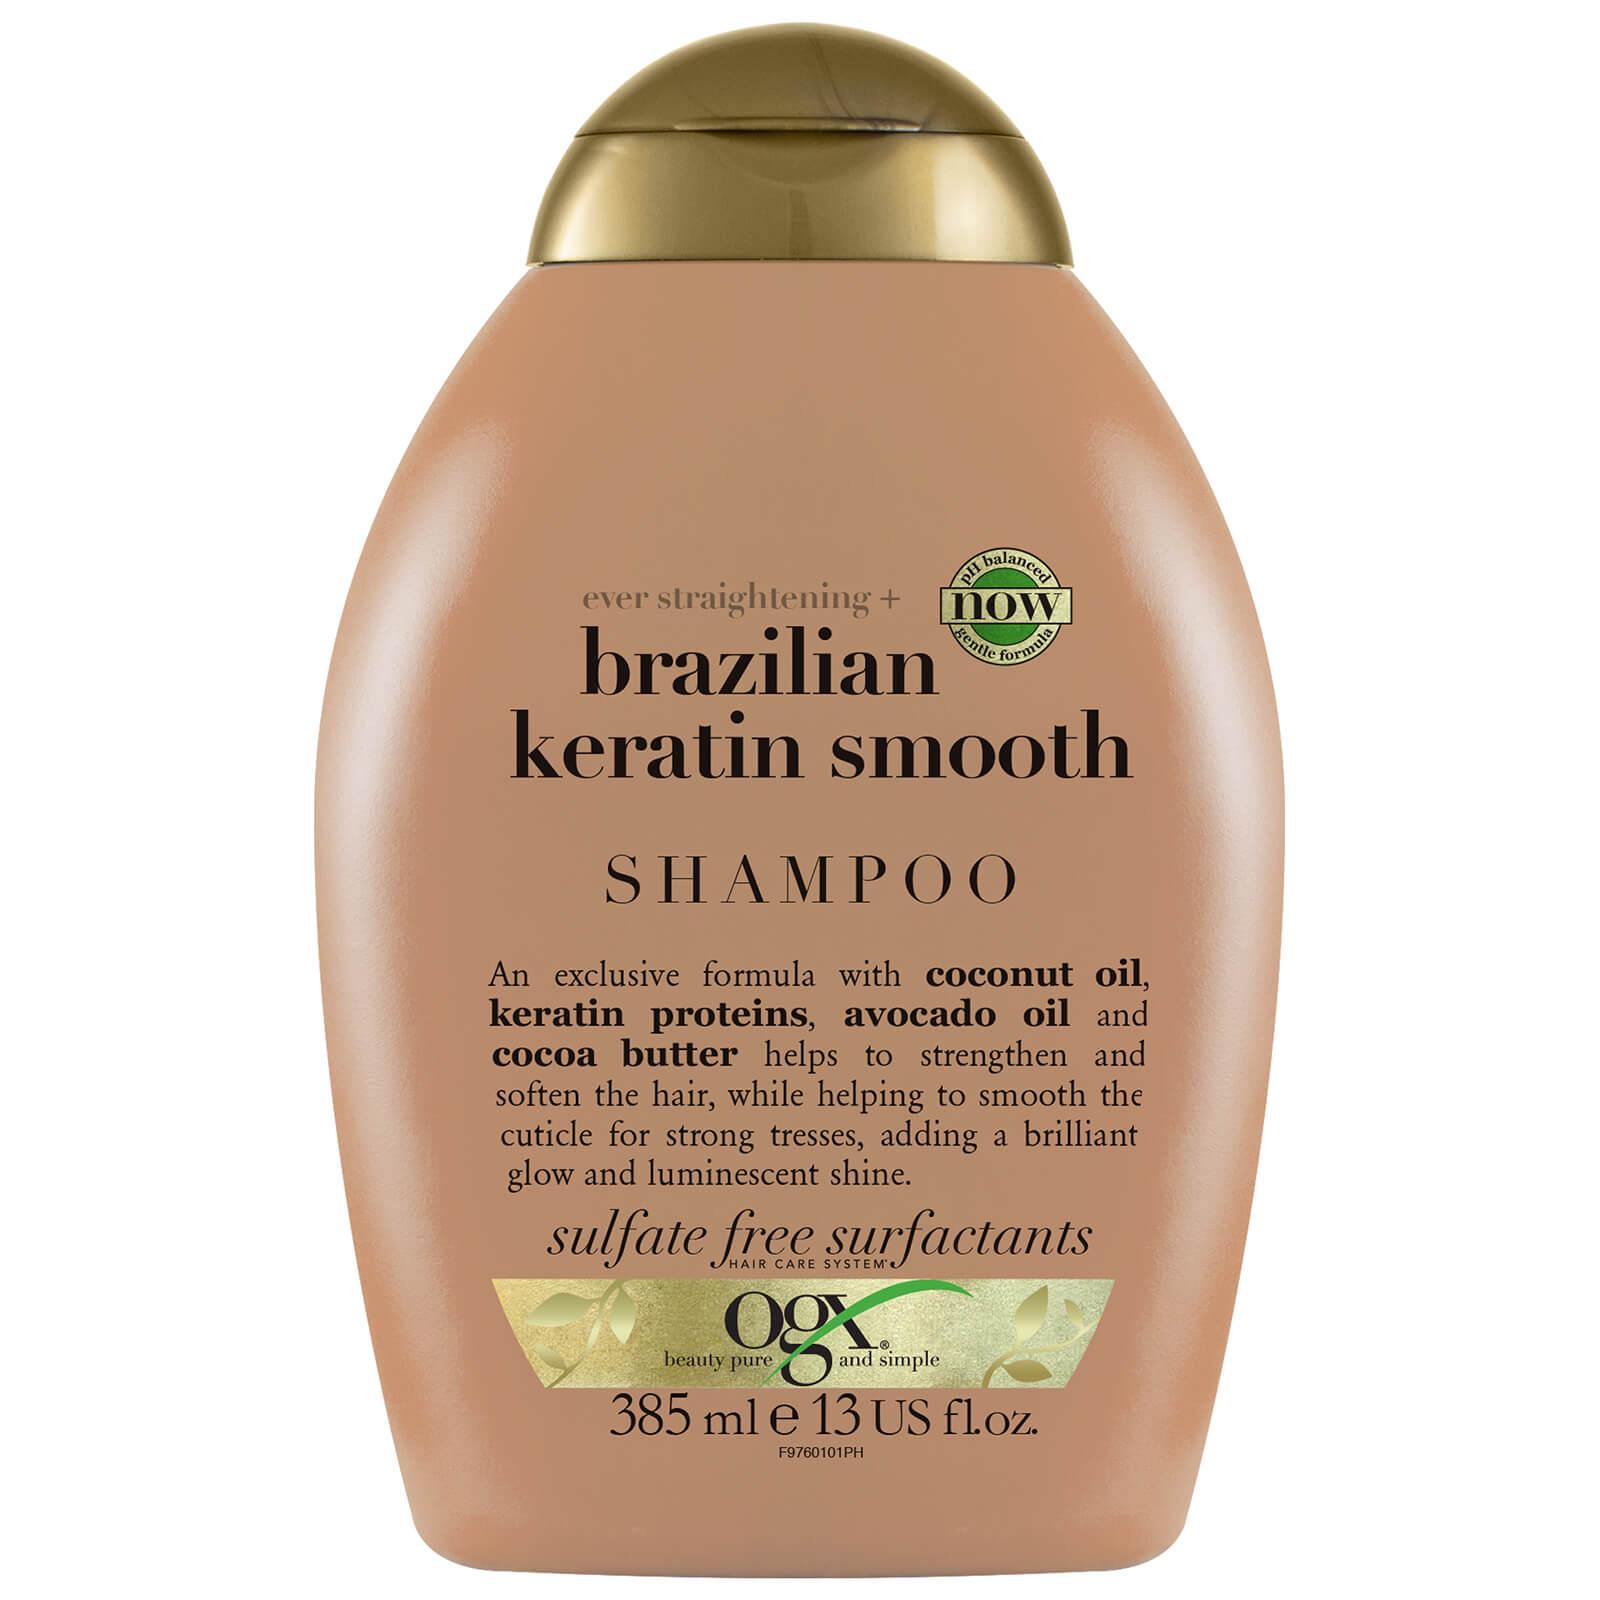 Купить OGX Ever Straightening+ Brazilian Keratin Smooth Shampoo 385ml